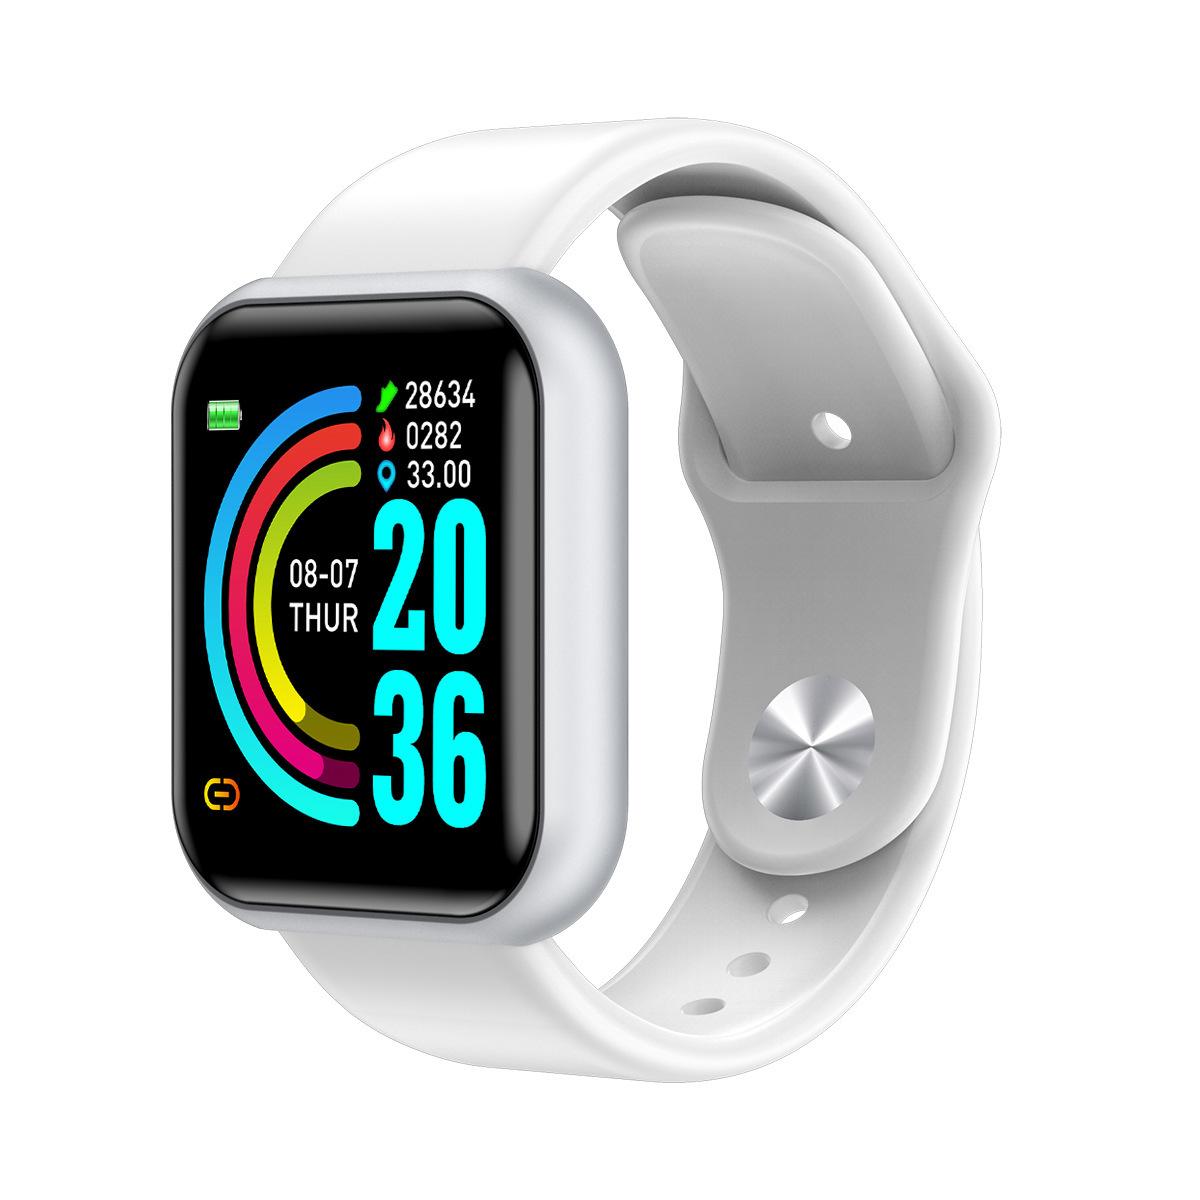 D20 Smart Bracelet IP67 Waterproof TPU Strap Step Count Blood Pressure Heart Rate Monitoring Watch white